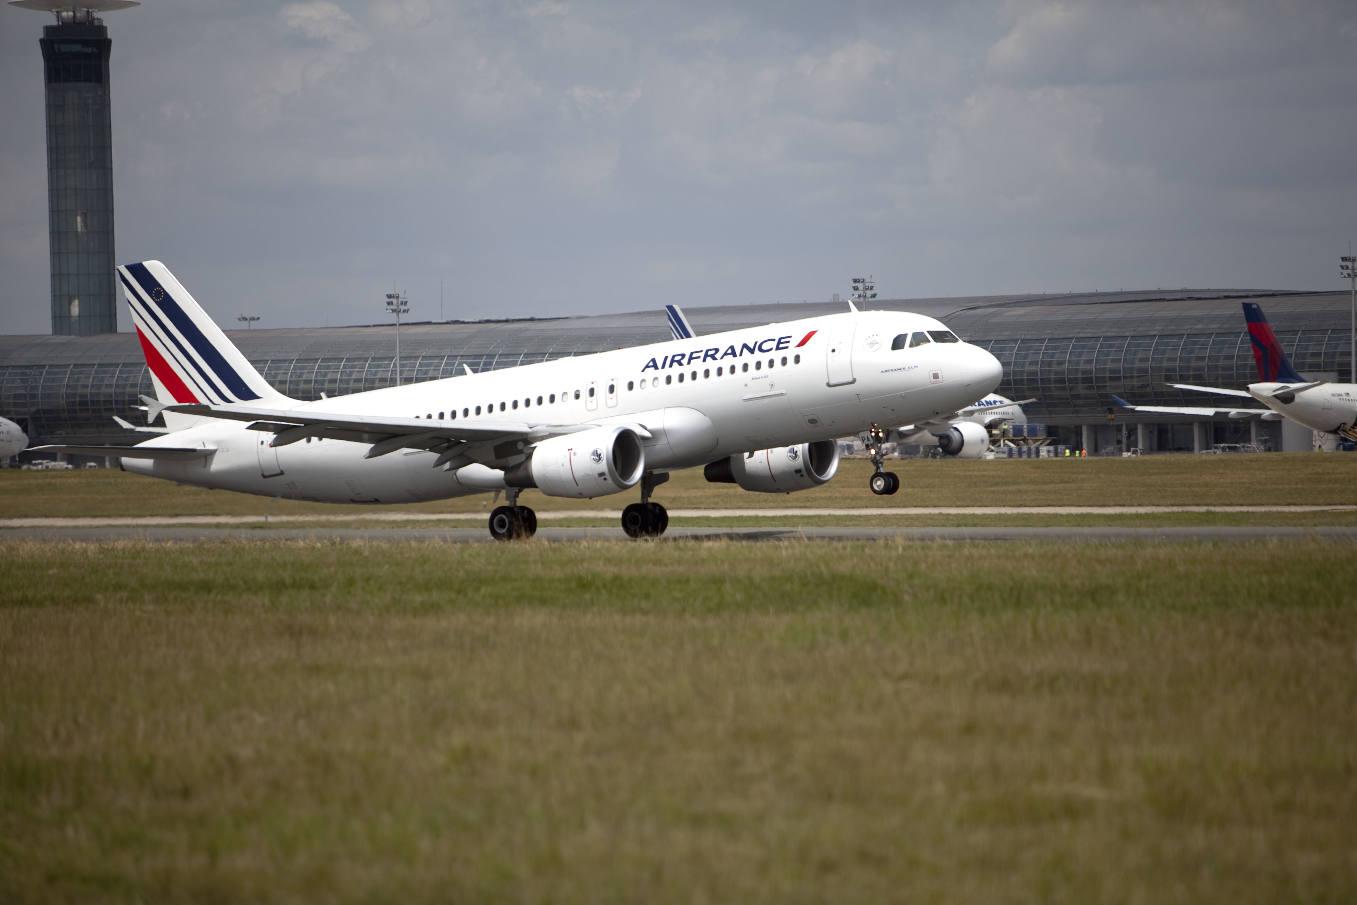 Near-collision between Egyptair, Air France aircraft over Belgium